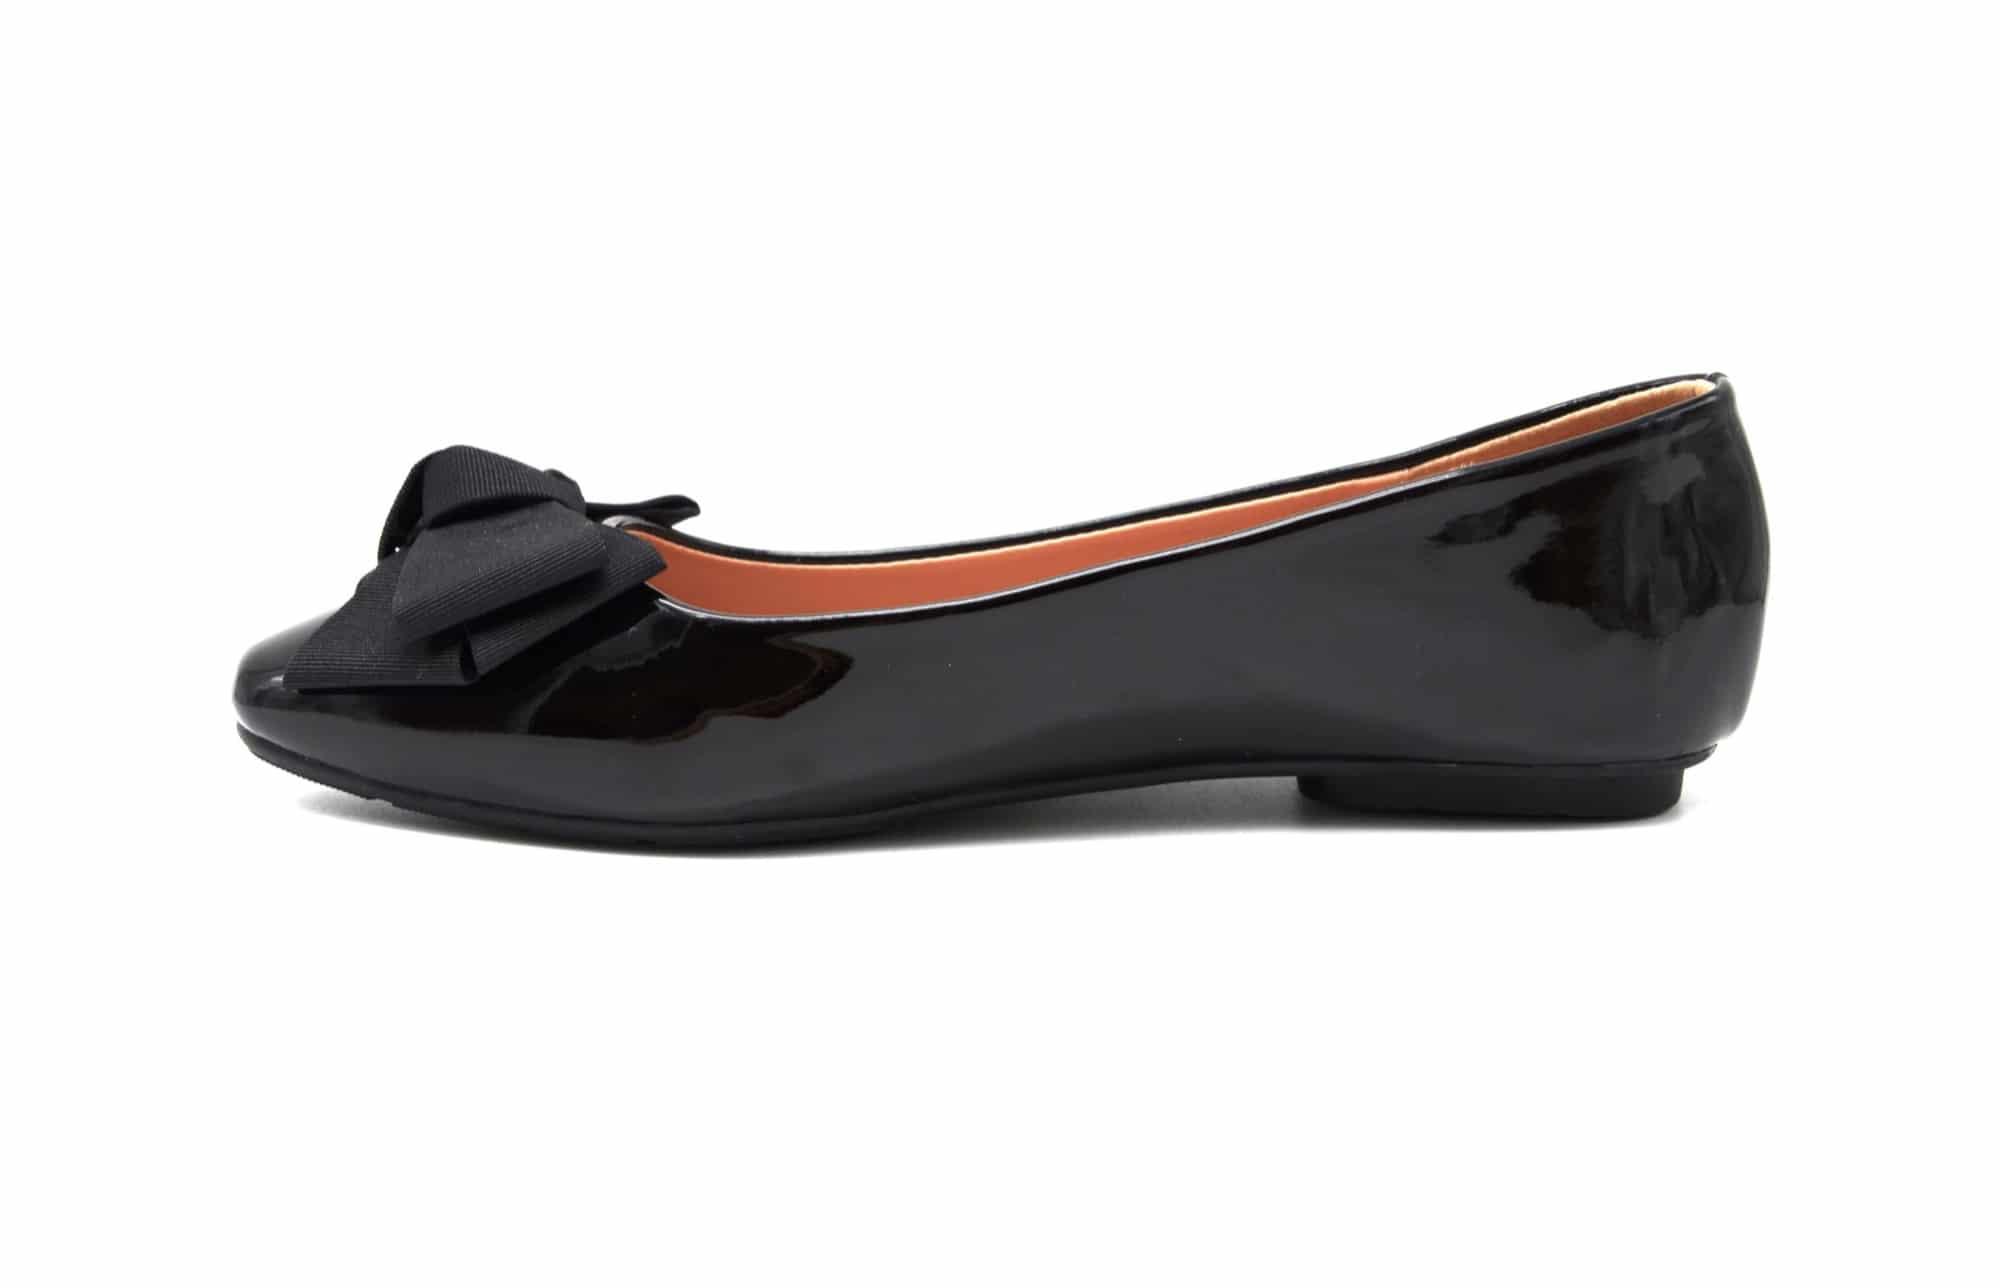 shf81 ballerines vernies avec noeud rubans larges et bout carr noir oh my shop. Black Bedroom Furniture Sets. Home Design Ideas